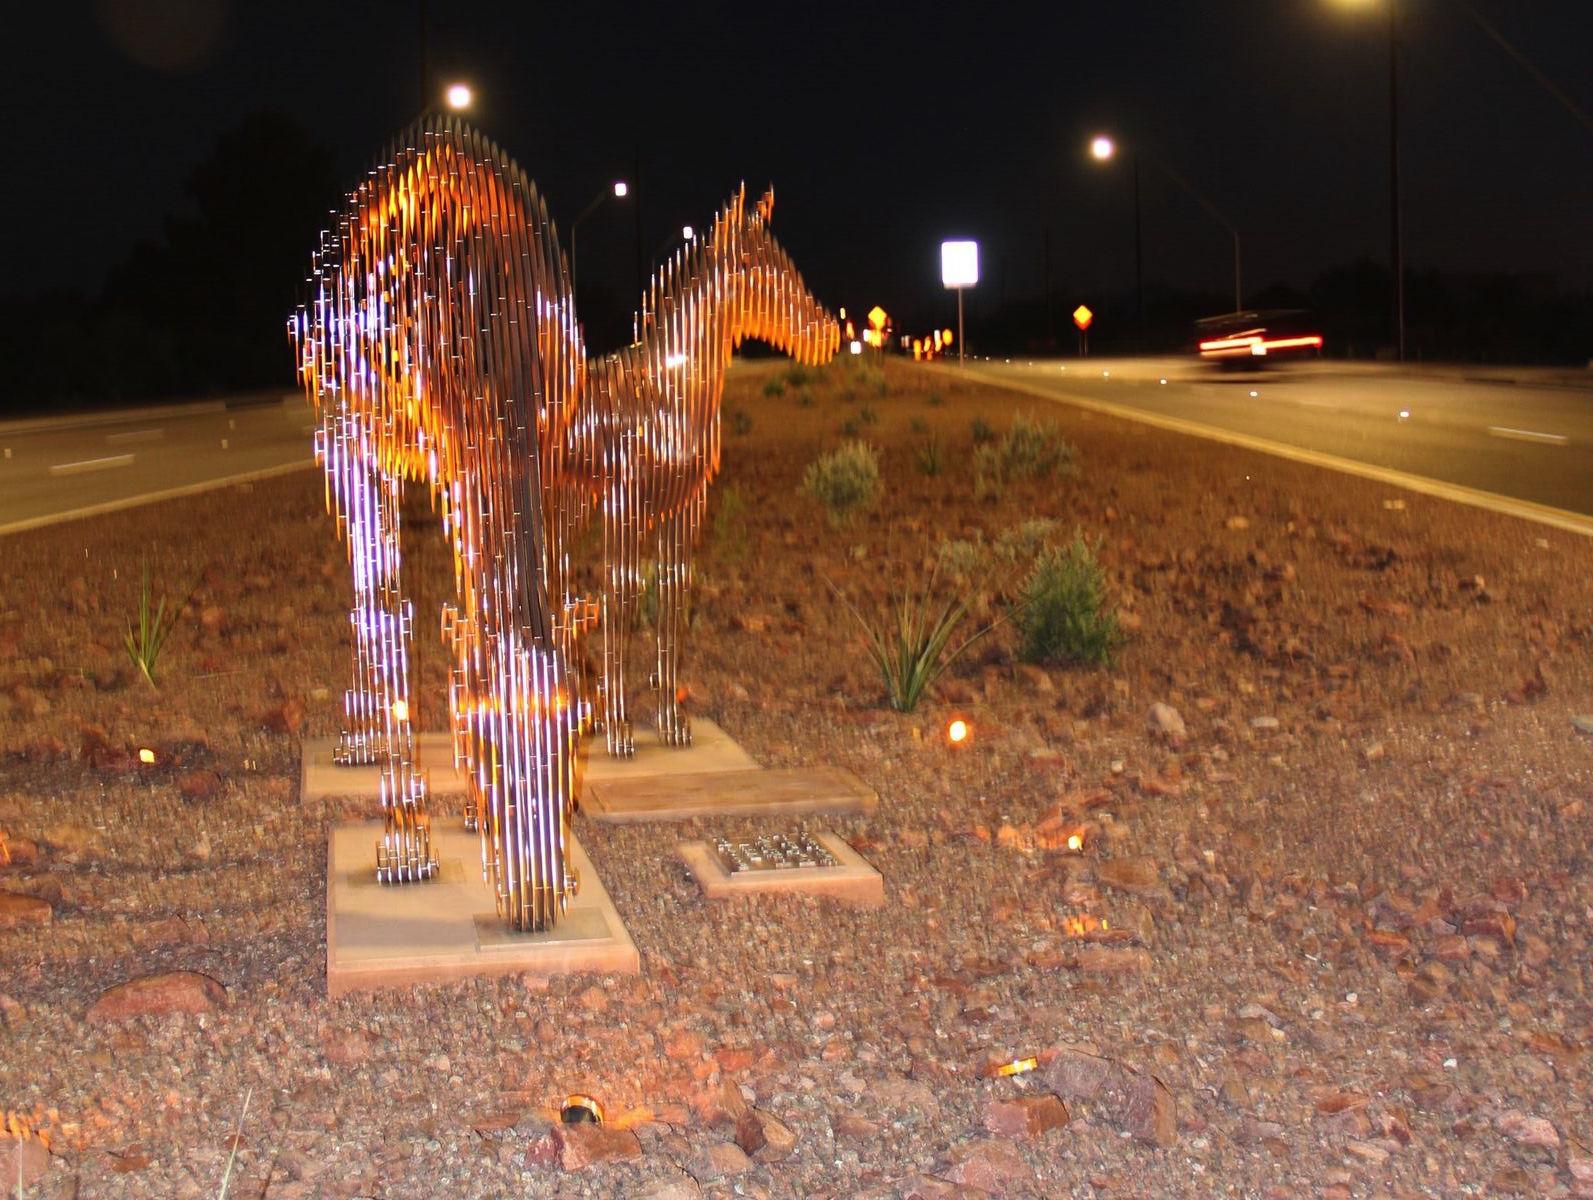 Horses on Houghton at night.jpg